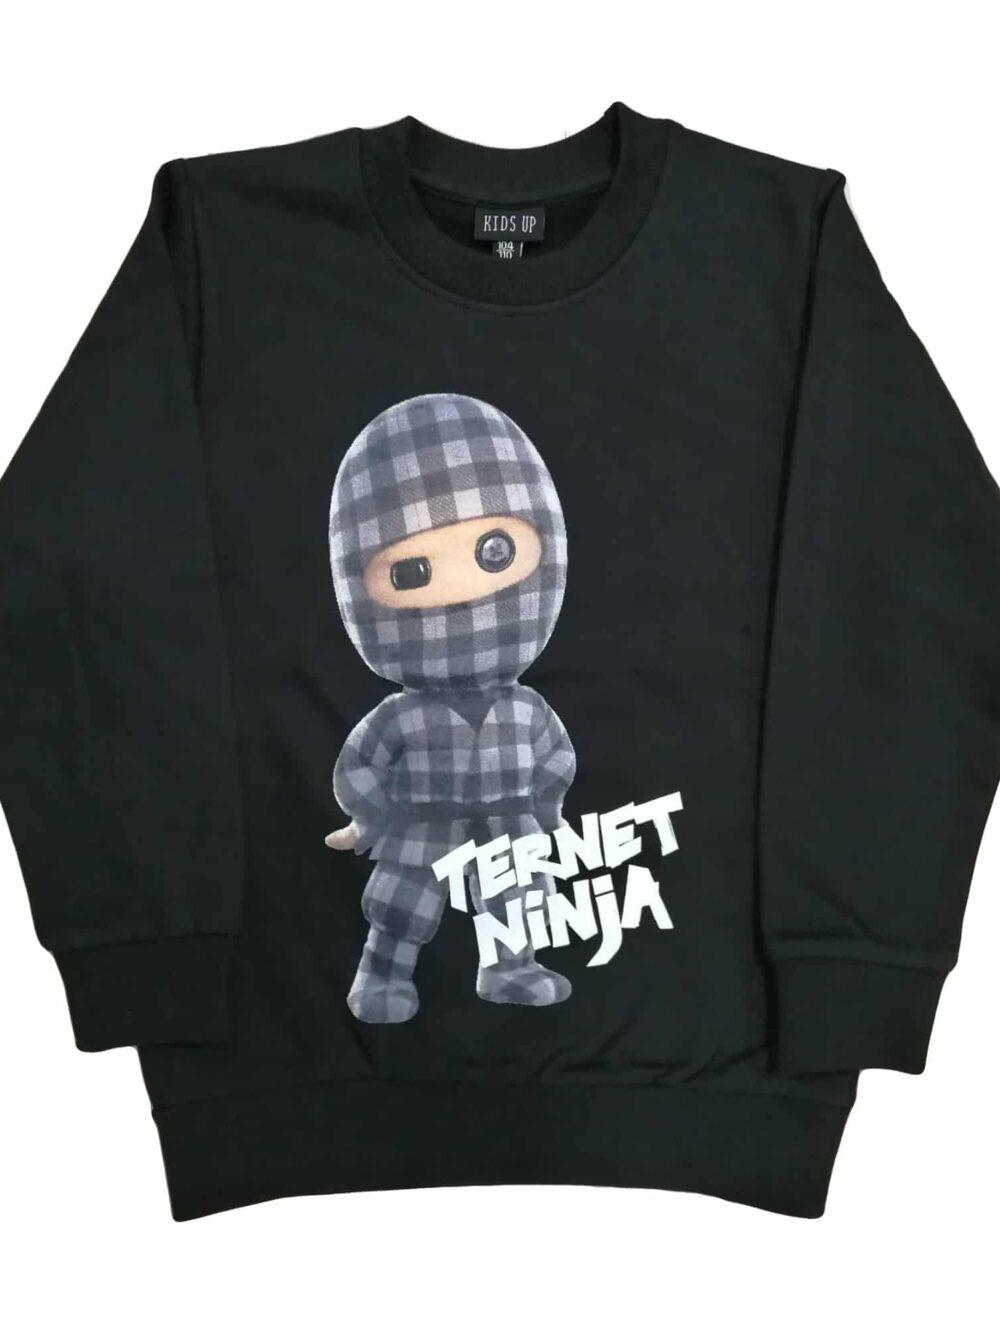 Kids Up Ternet Ninja Sweatshirt Black